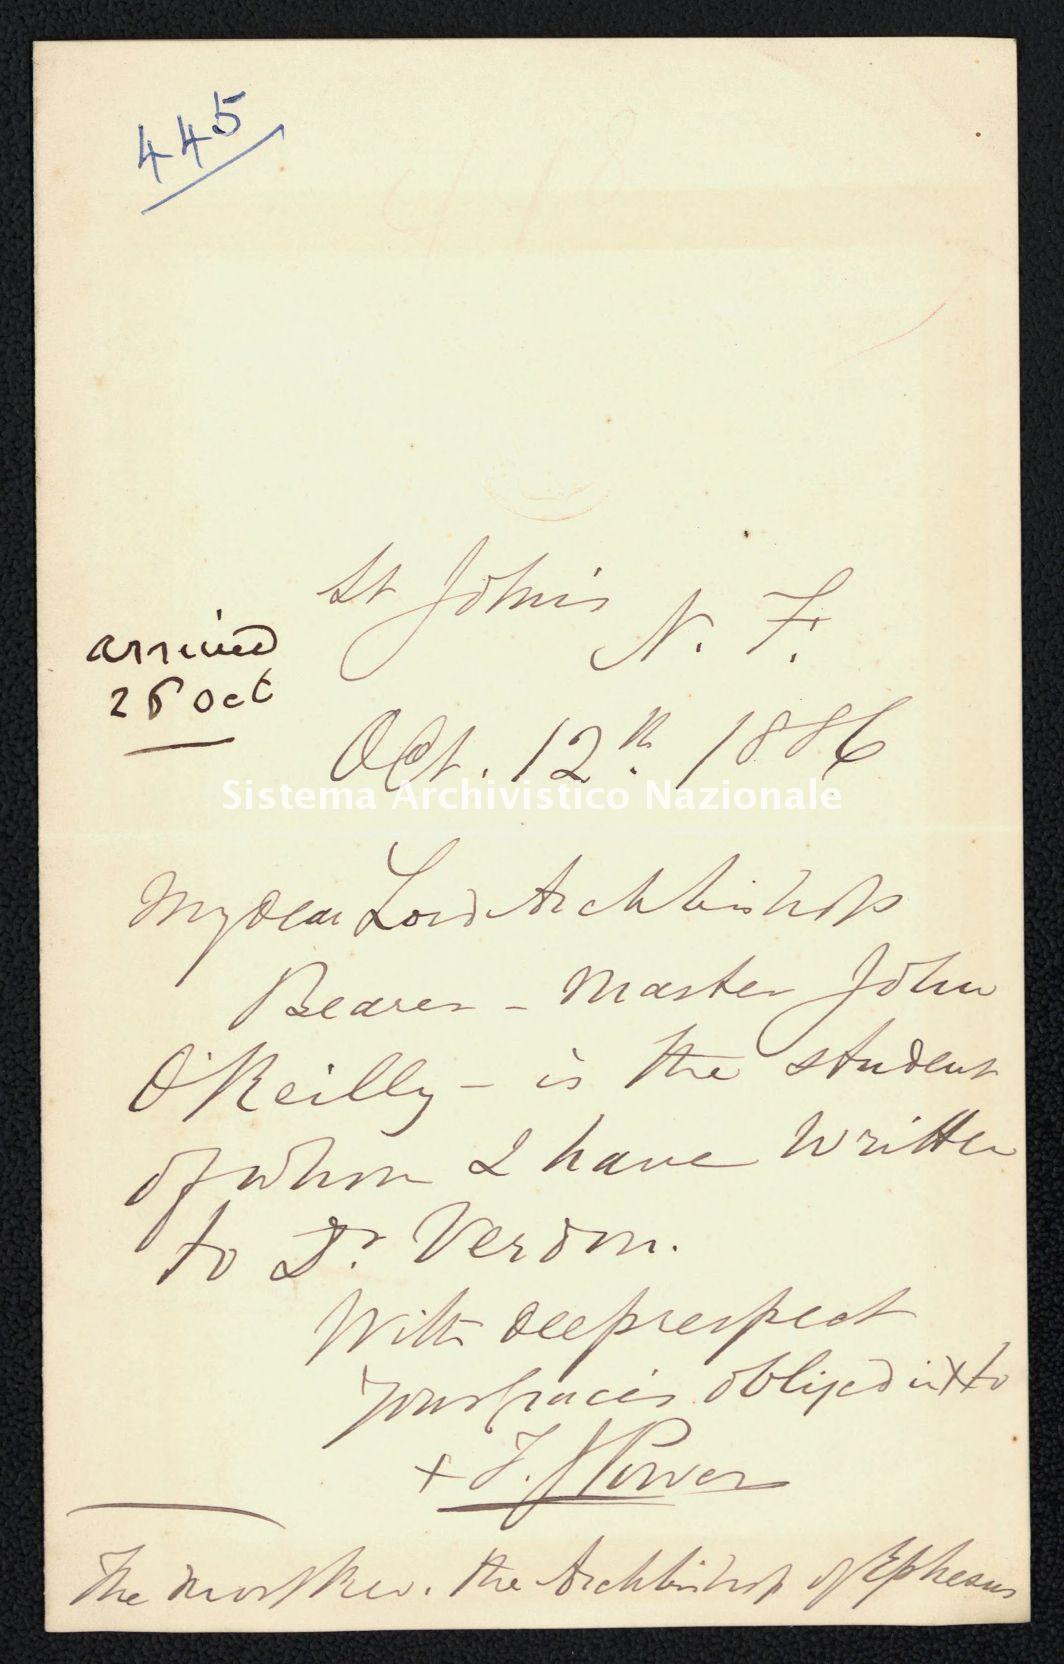 Pontificio Collegio Irlandese - Kirby_1886_445